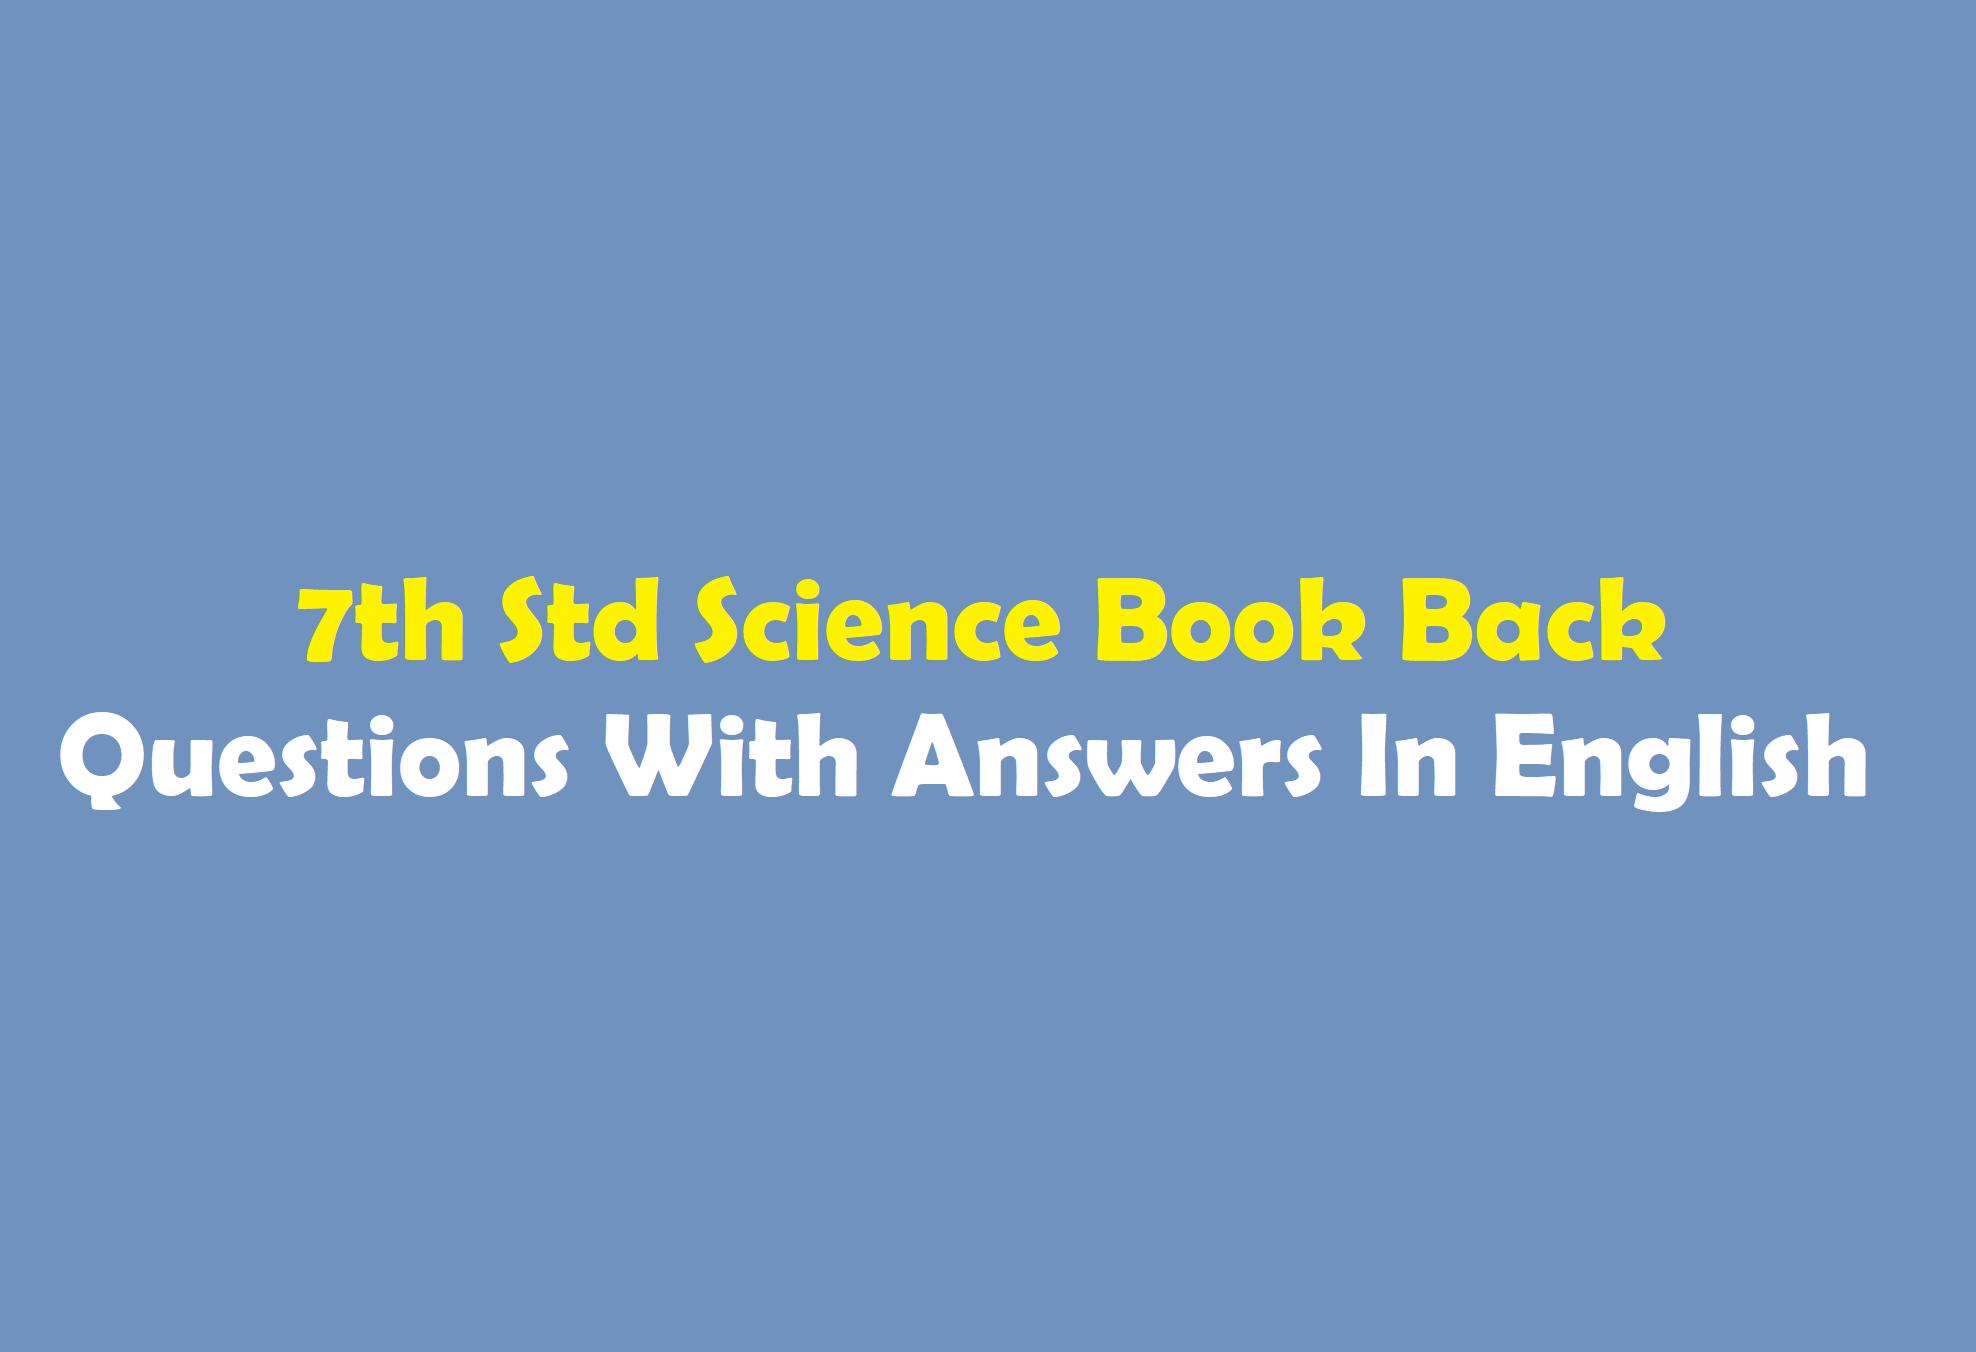 Samacheer Kalvi 7th Science Book